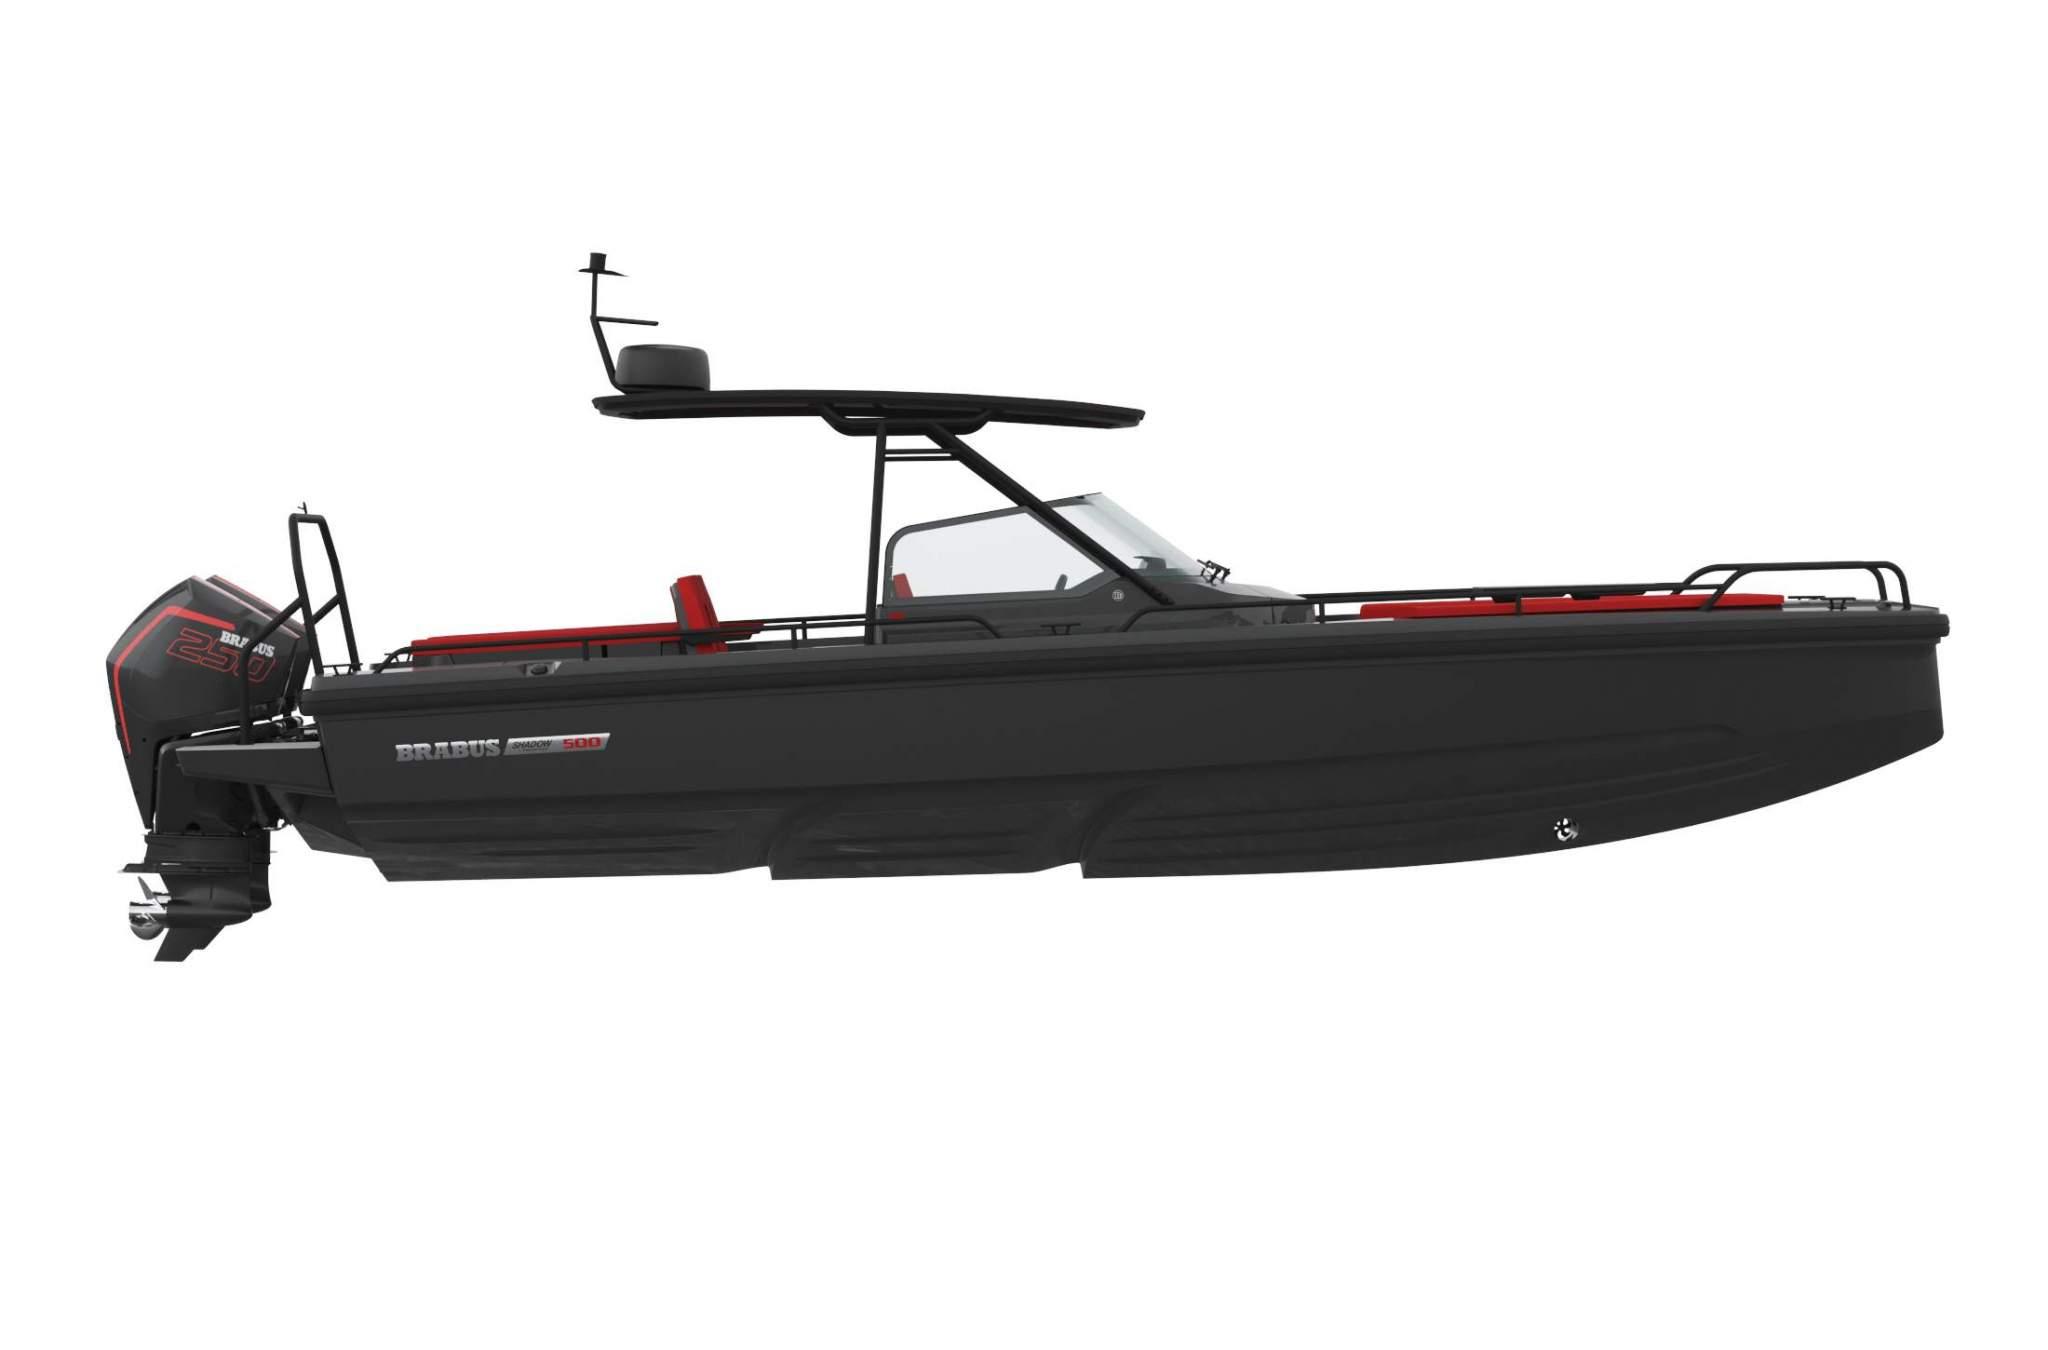 Brabus 28 foot sportsboat, Eyachts Australia and New Zealand